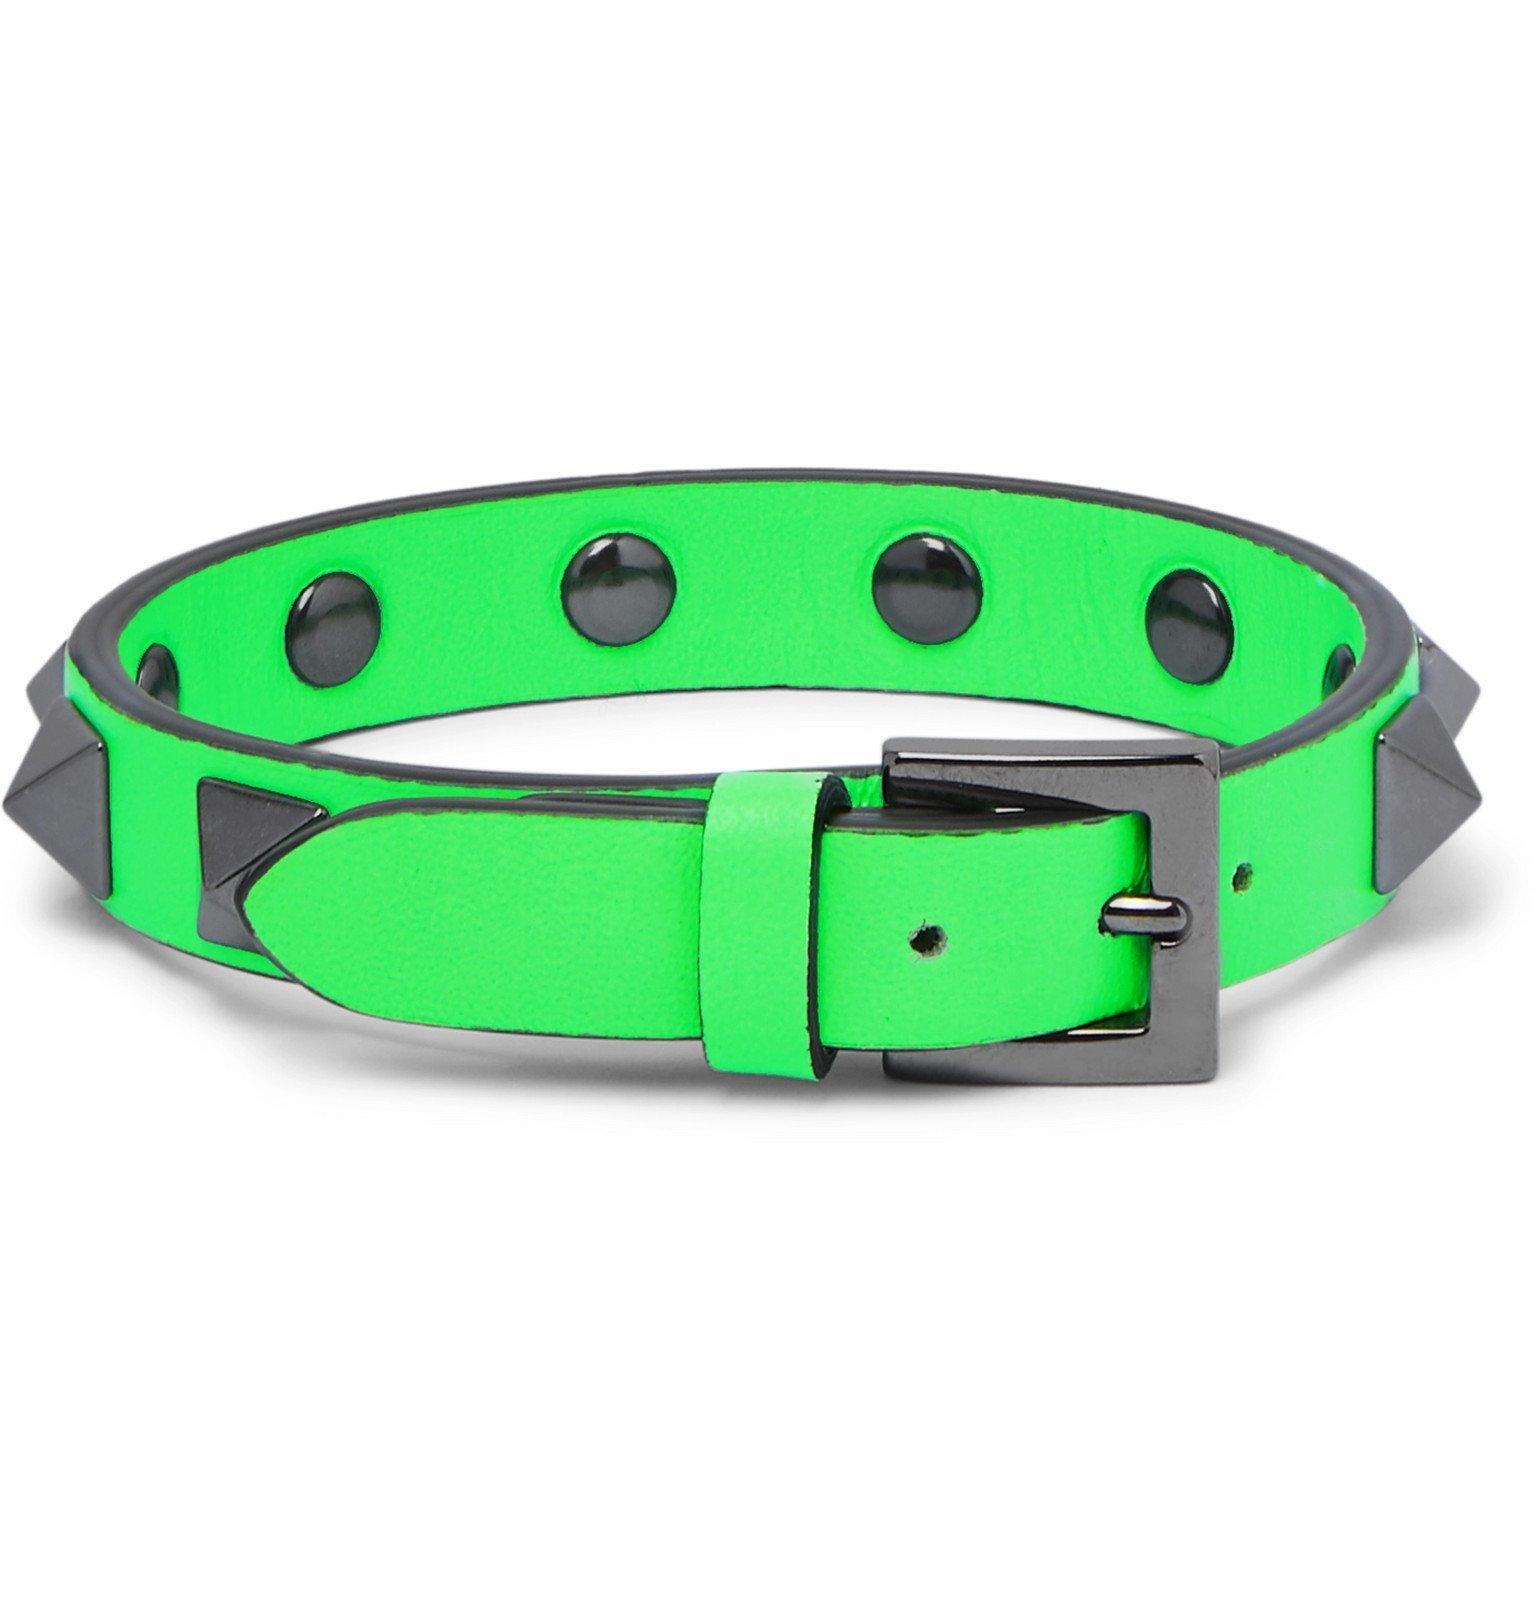 Valentino - Valentino Garavani Rockstud Leather and Ruthenium Bracelet - Green